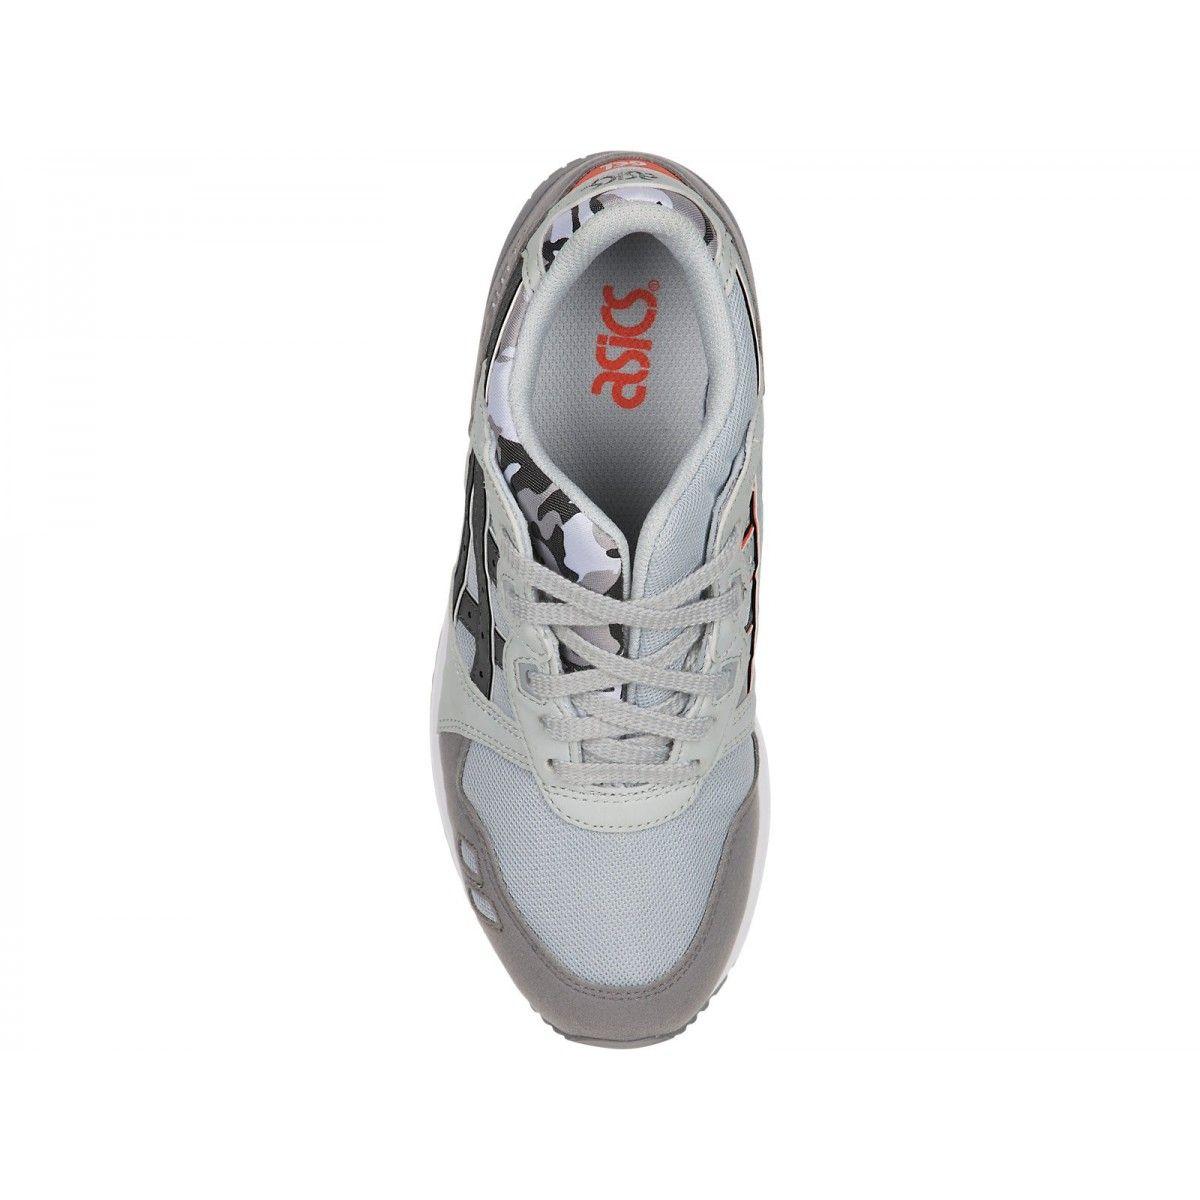 chaussure asics taille 38 garcon